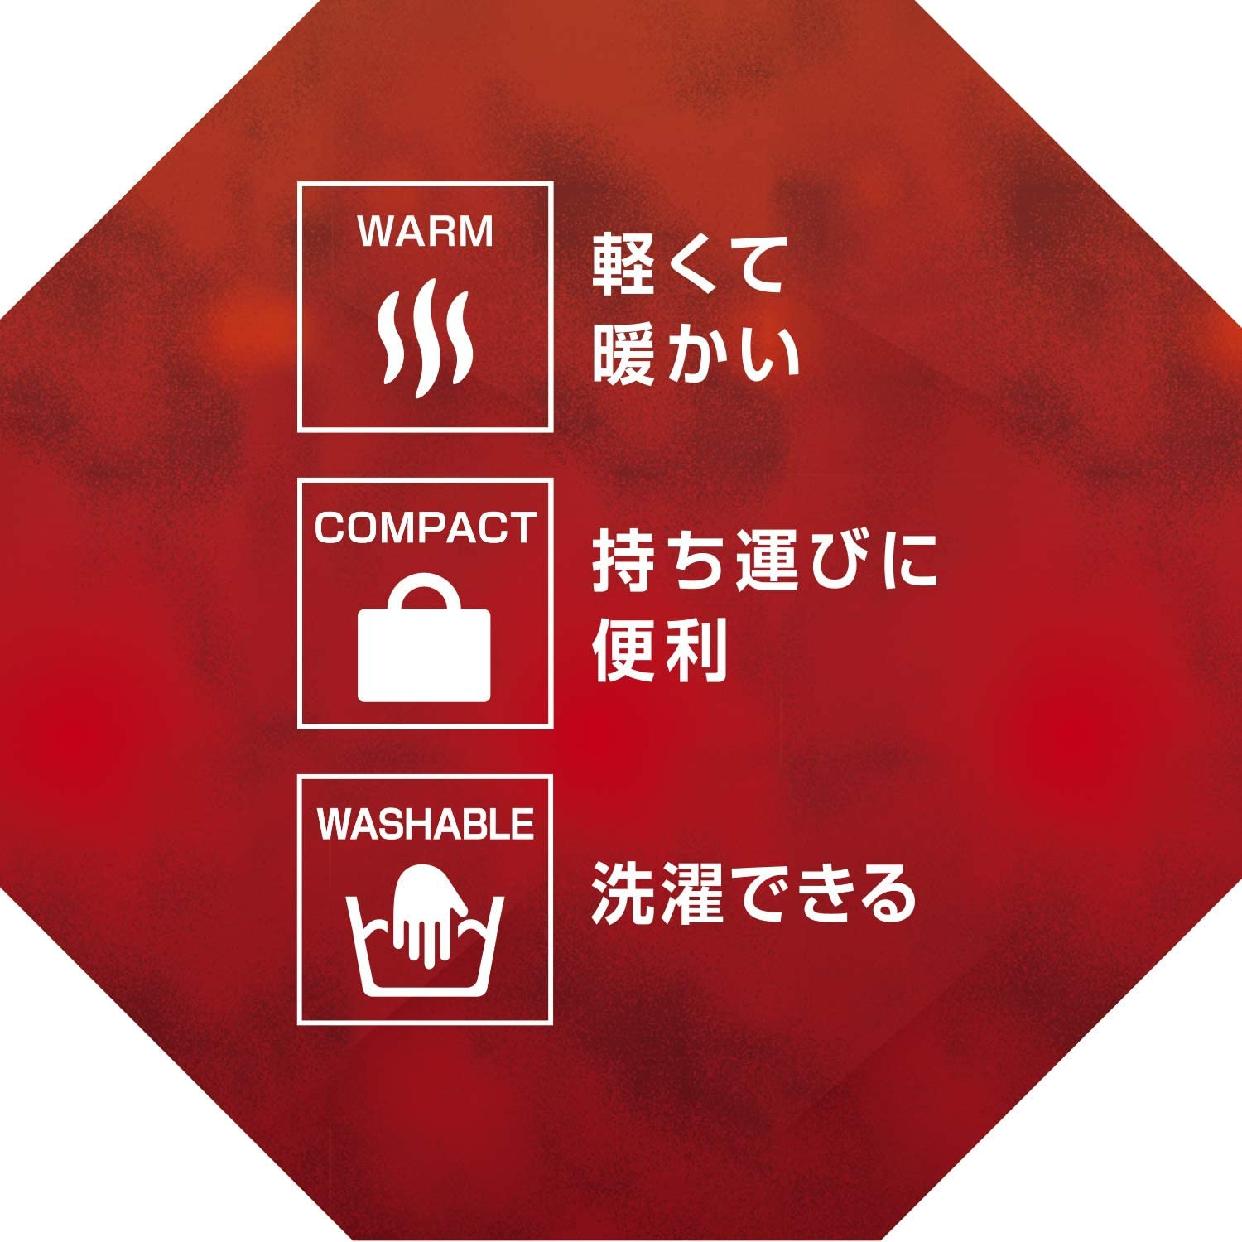 MIZUNO(ミズノ)ルームシューズの商品画像4